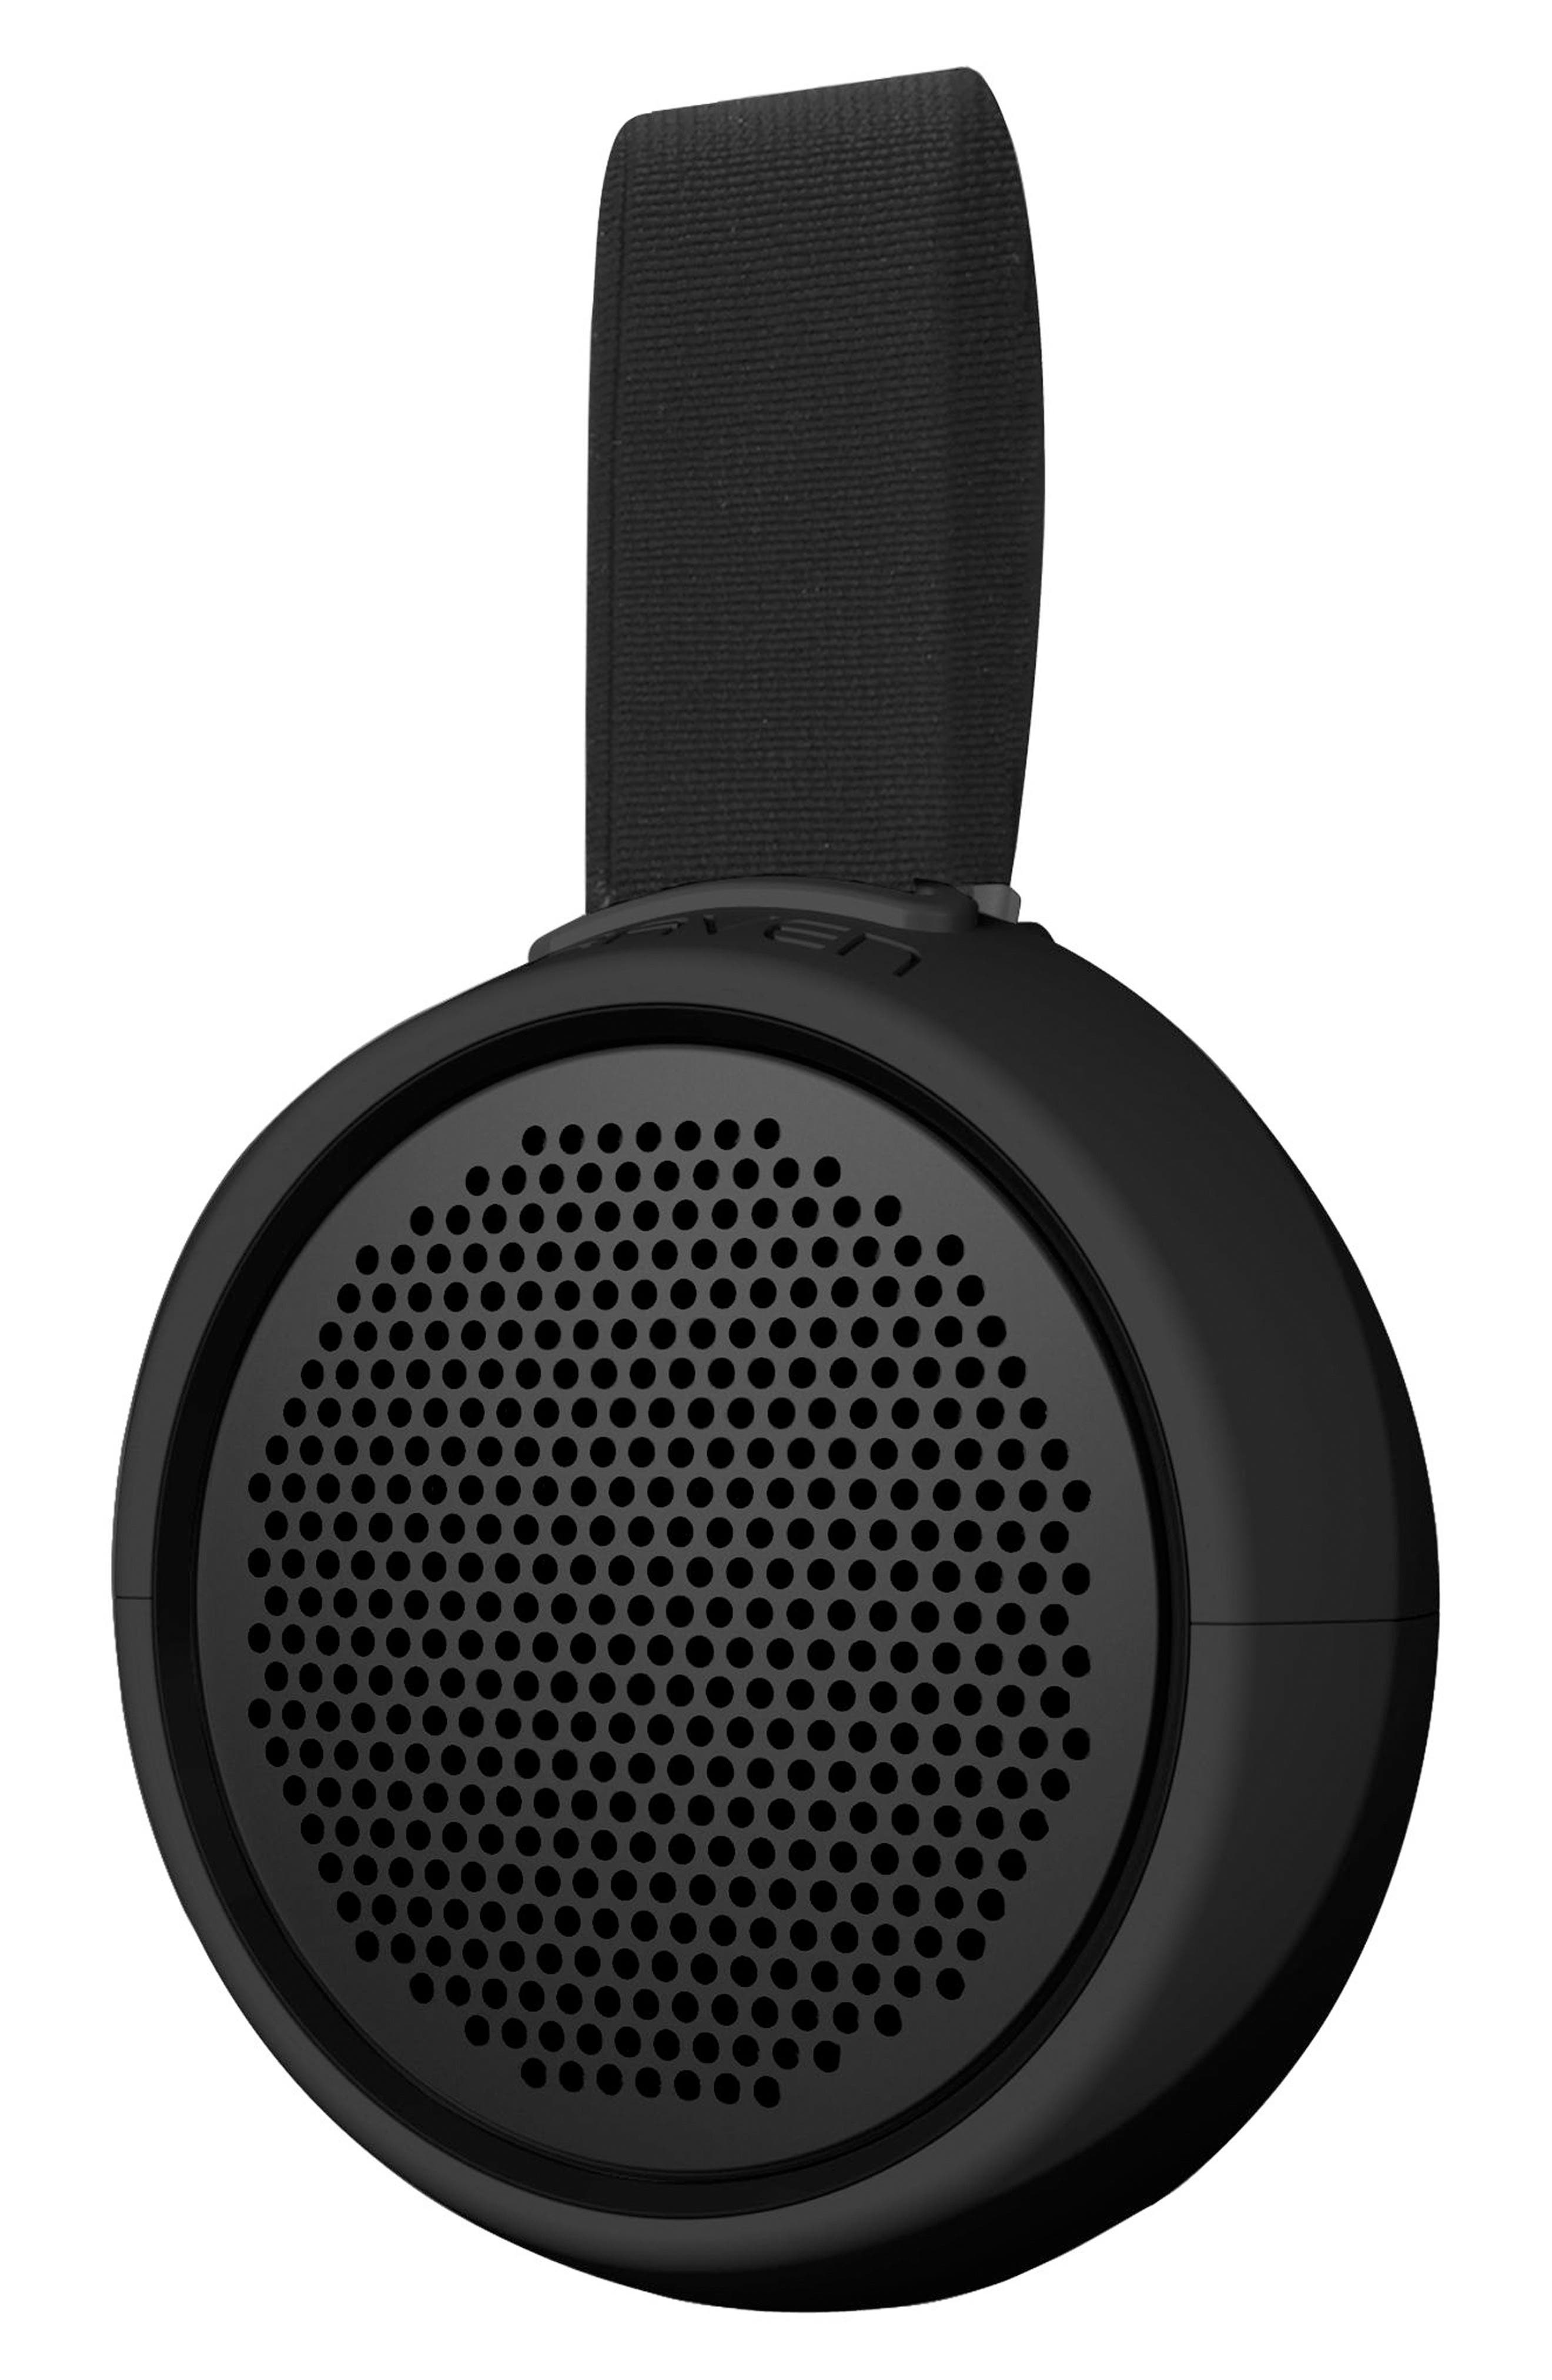 BRAVEN 105 Portable Waterproof Bluetooth Speaker